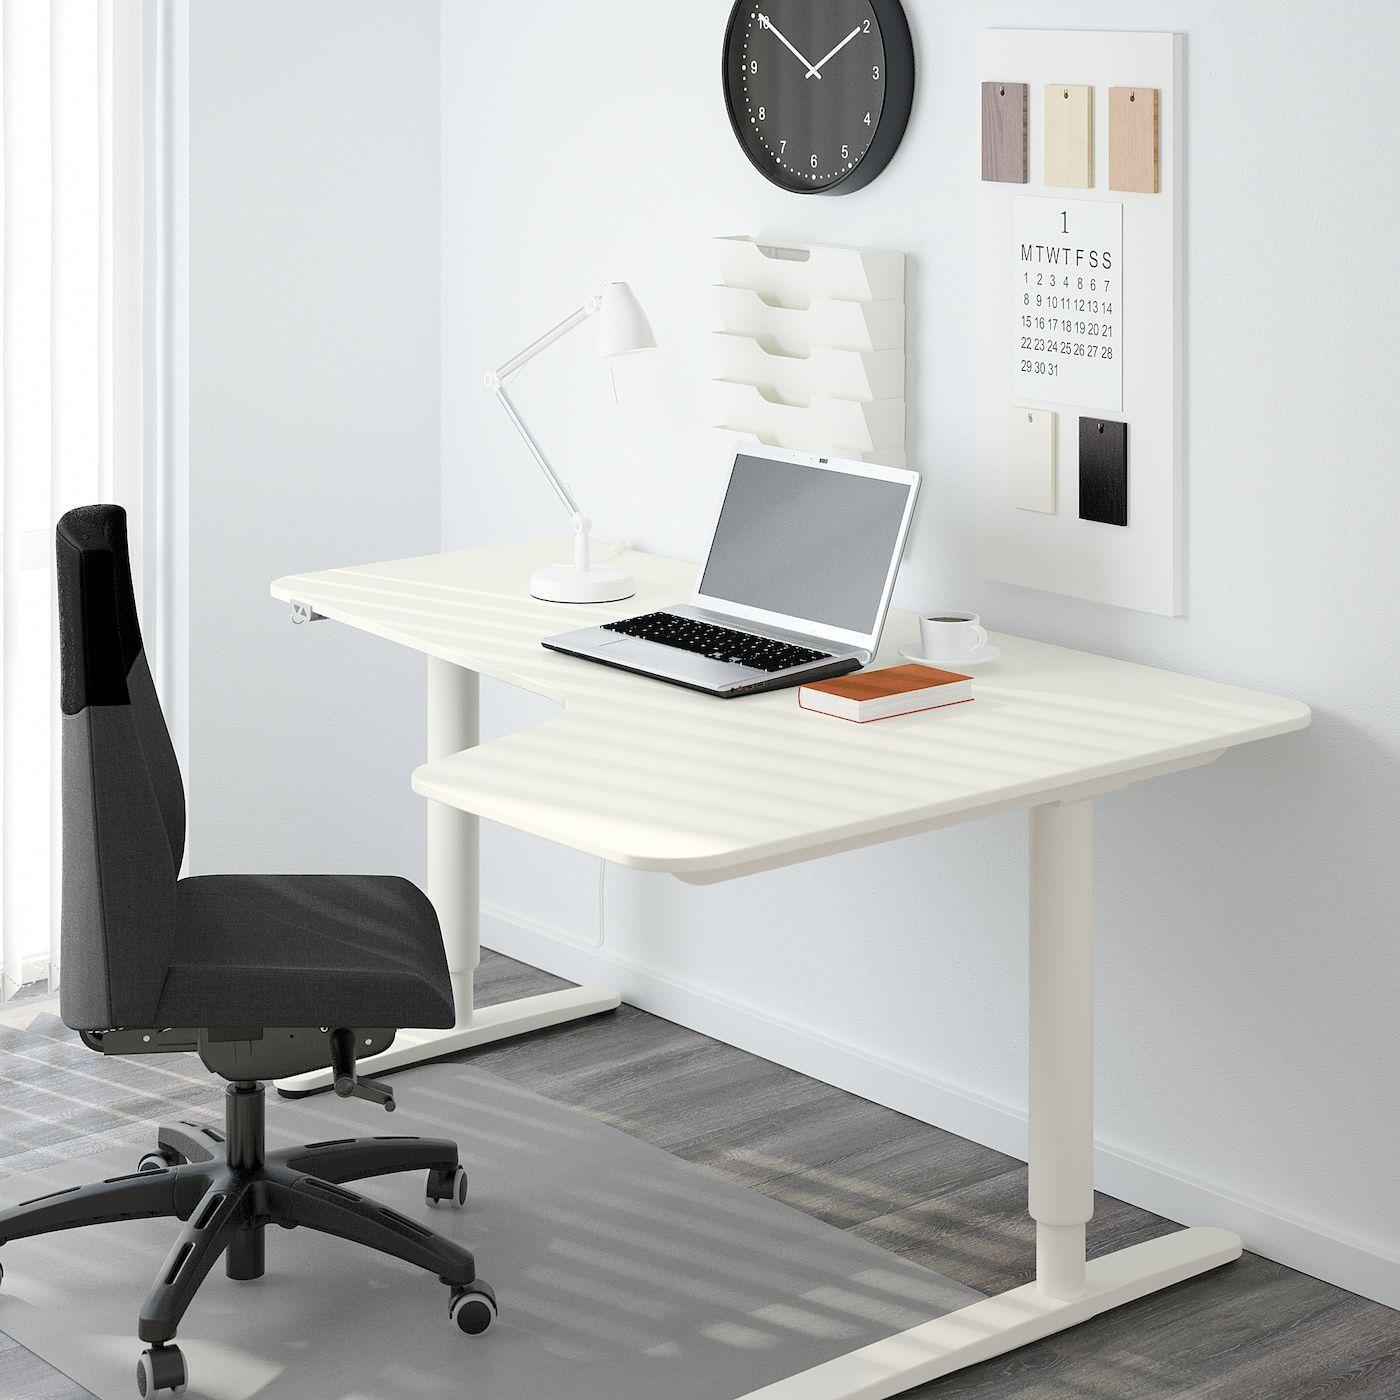 Bekant Ecktisch Rechts Sitz Steh Weiss Ikea Osterreich In 2020 Ikea Bekant Ikea Corner Table